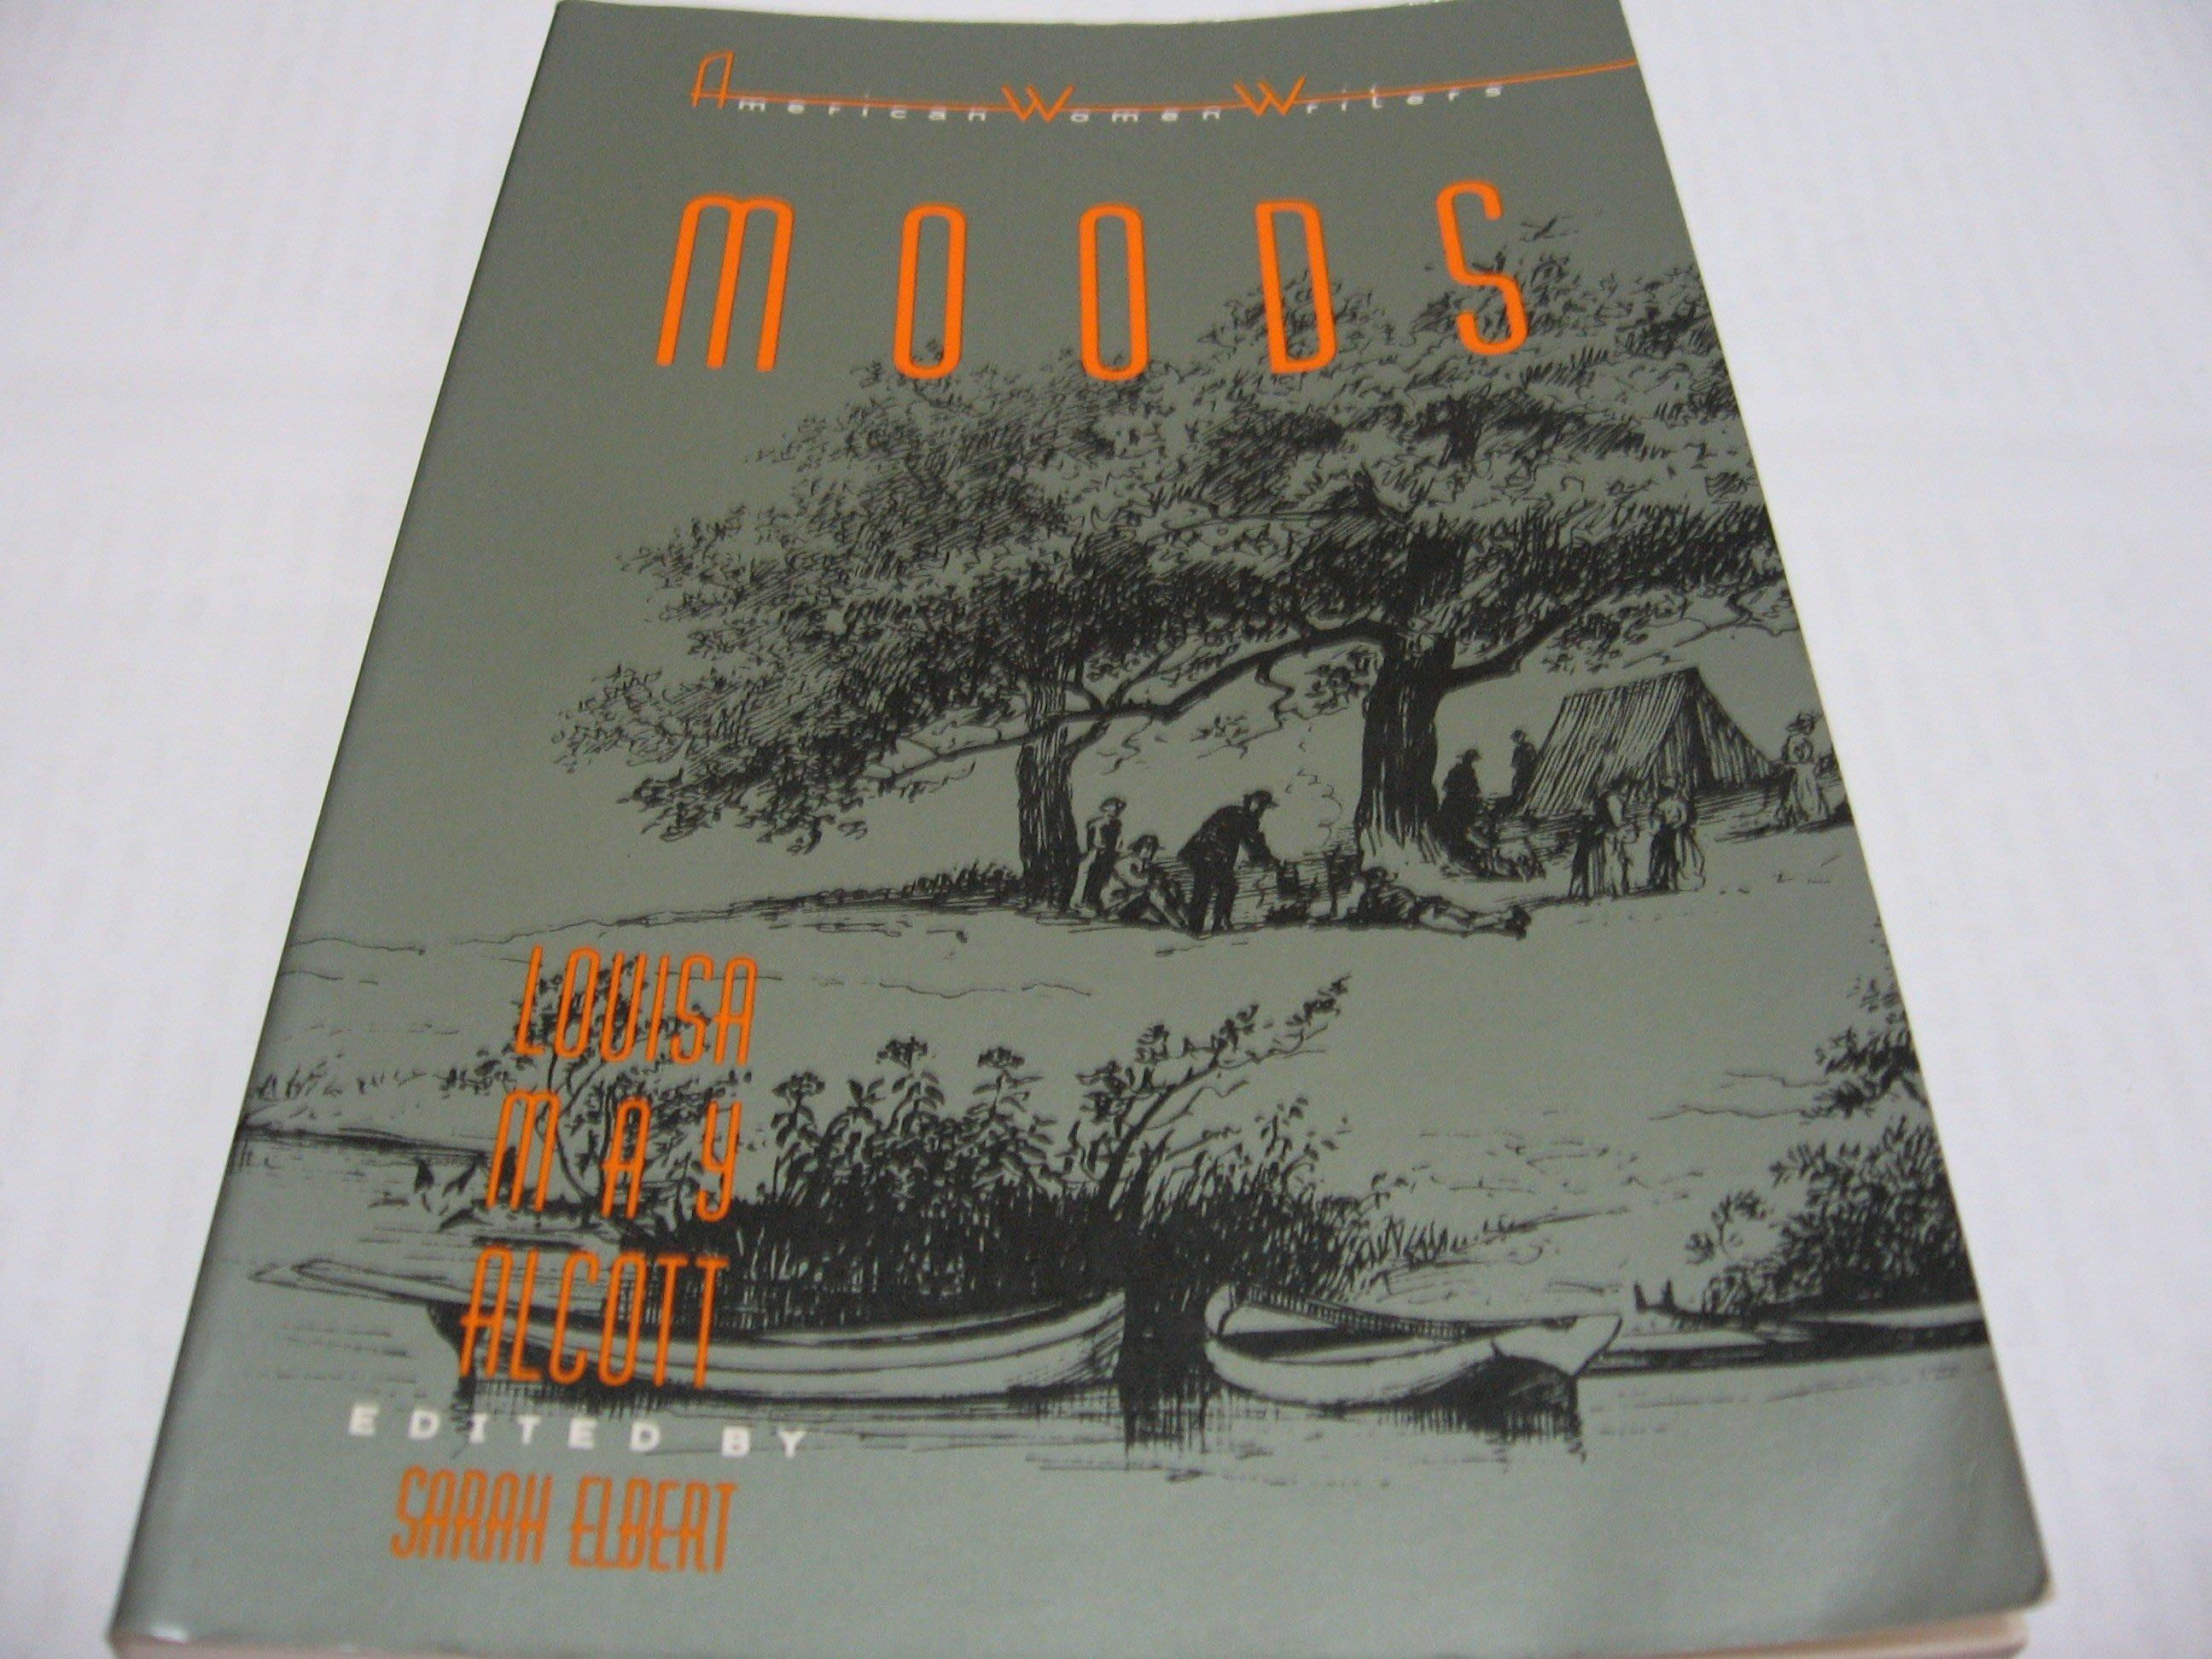 Moods/ Louisa May Alcott 英文小說 一般平裝本 舊書上側有黃斑 有若干畫線註記絕大多數為鉛筆